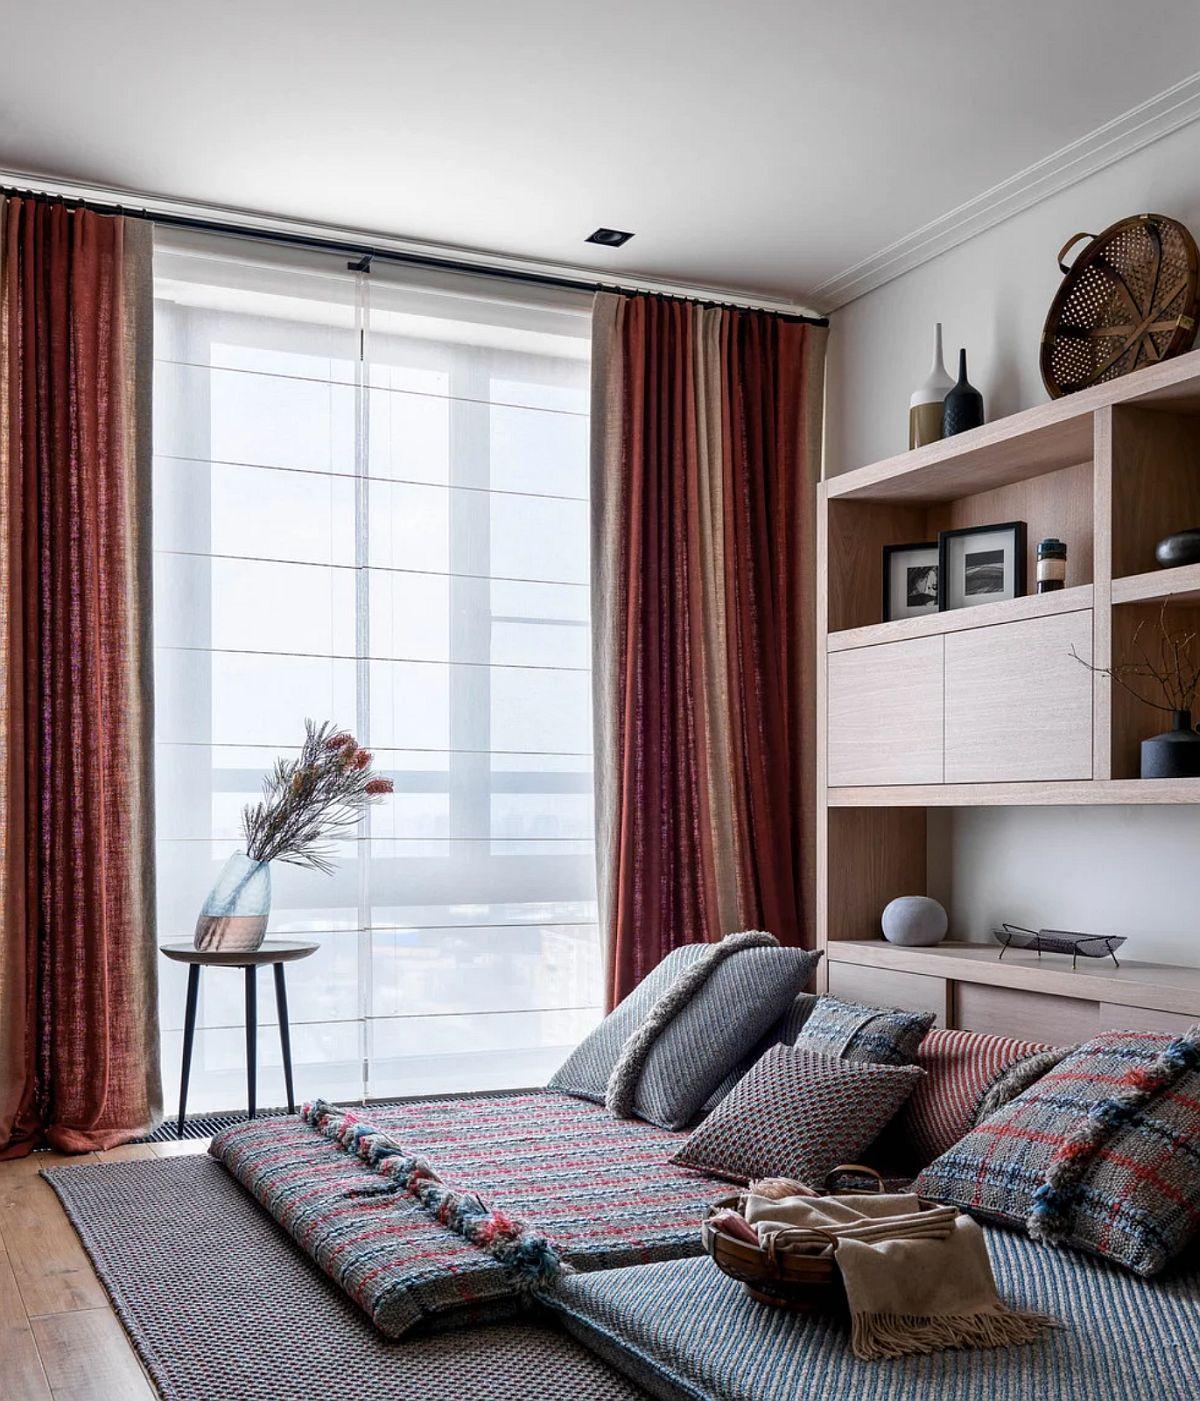 adelaparvu.com despre apartament 196 mp, designer Anna Pavlovskaya, Foto Serghei Krasyuk (14)